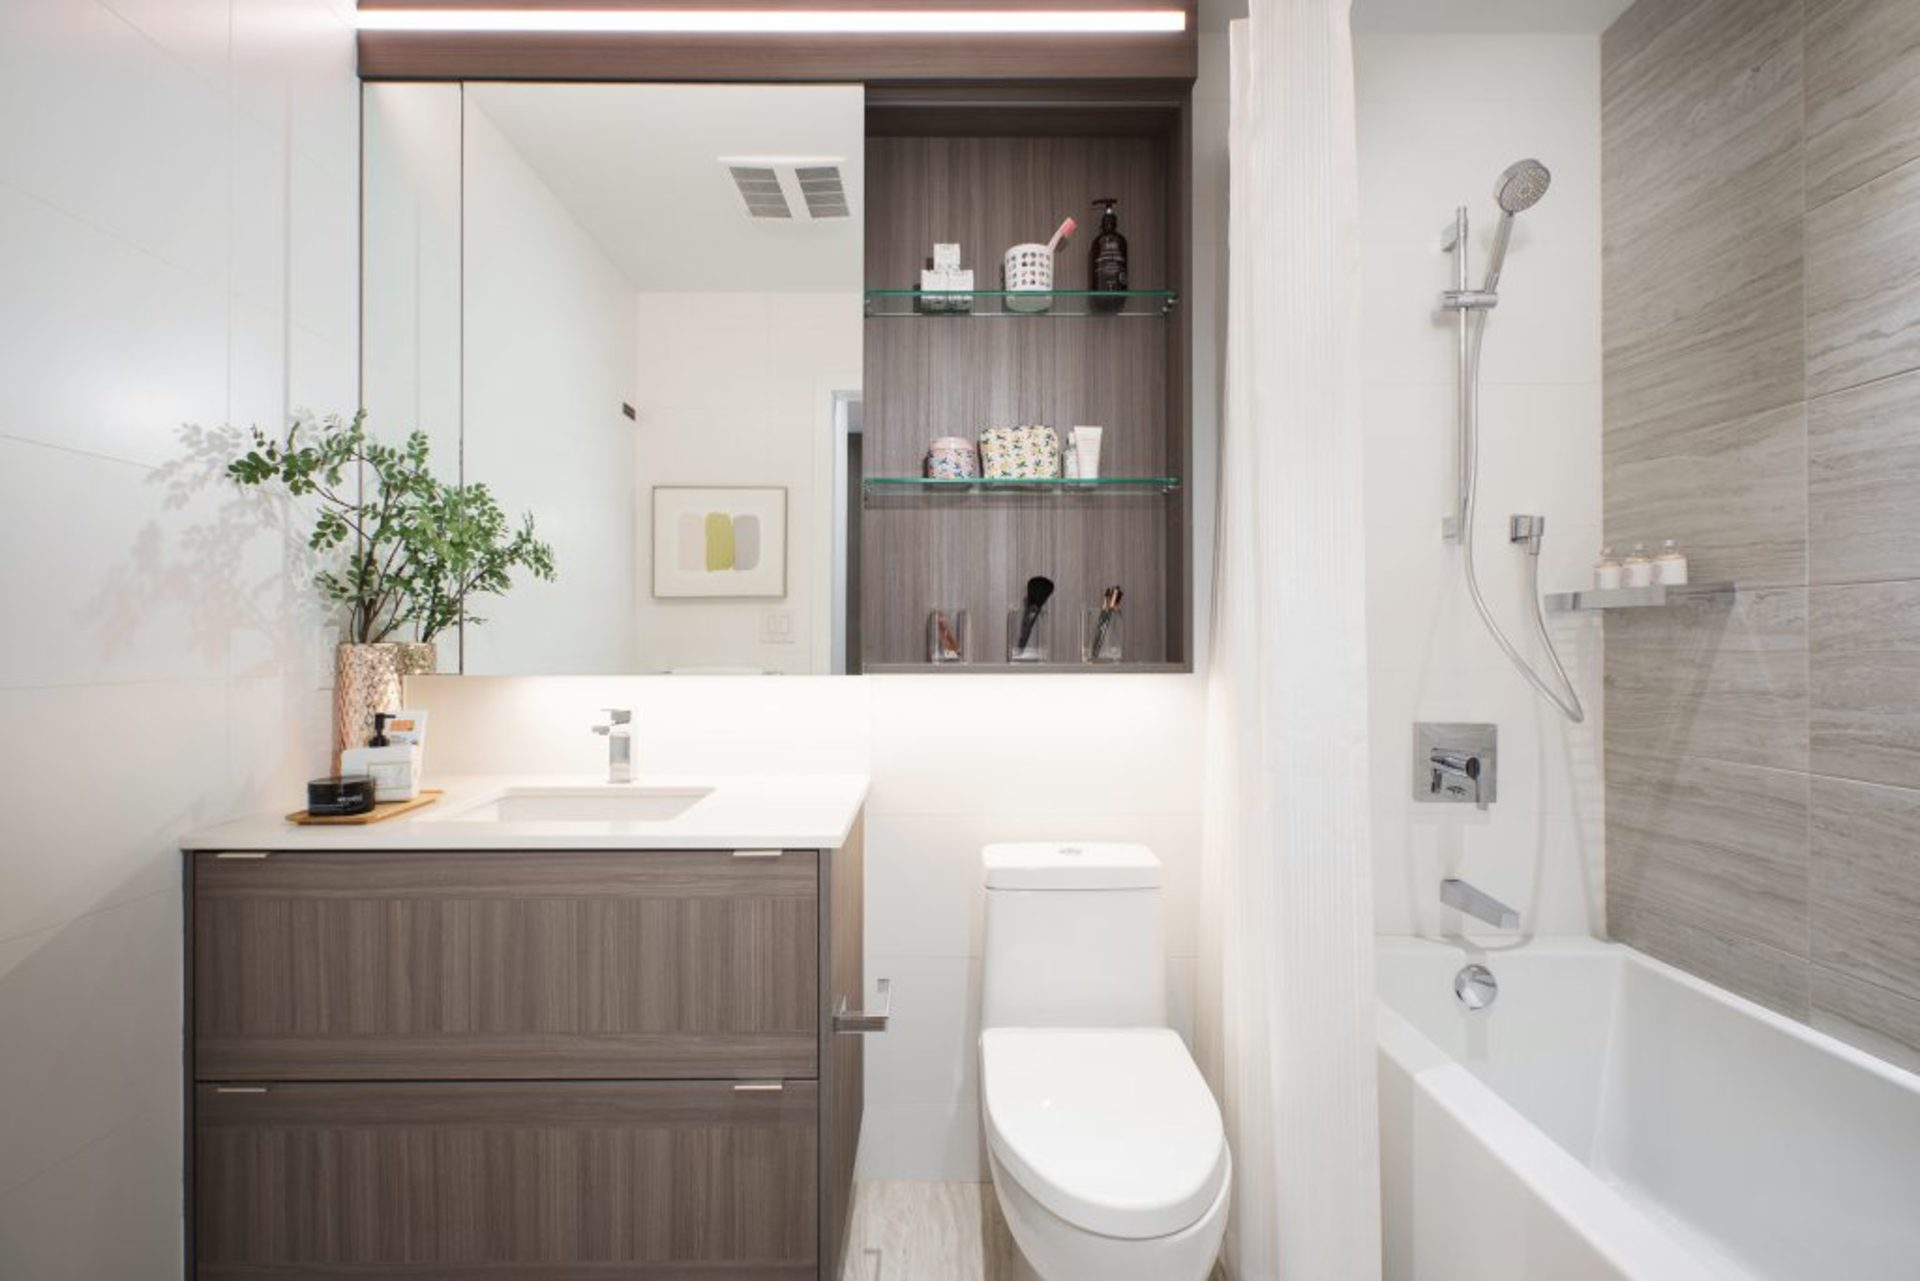 lumina-bathroom-2 at Waterfall  -  Lumina (2425 Beta Avenue, Brentwood Park, Burnaby North)